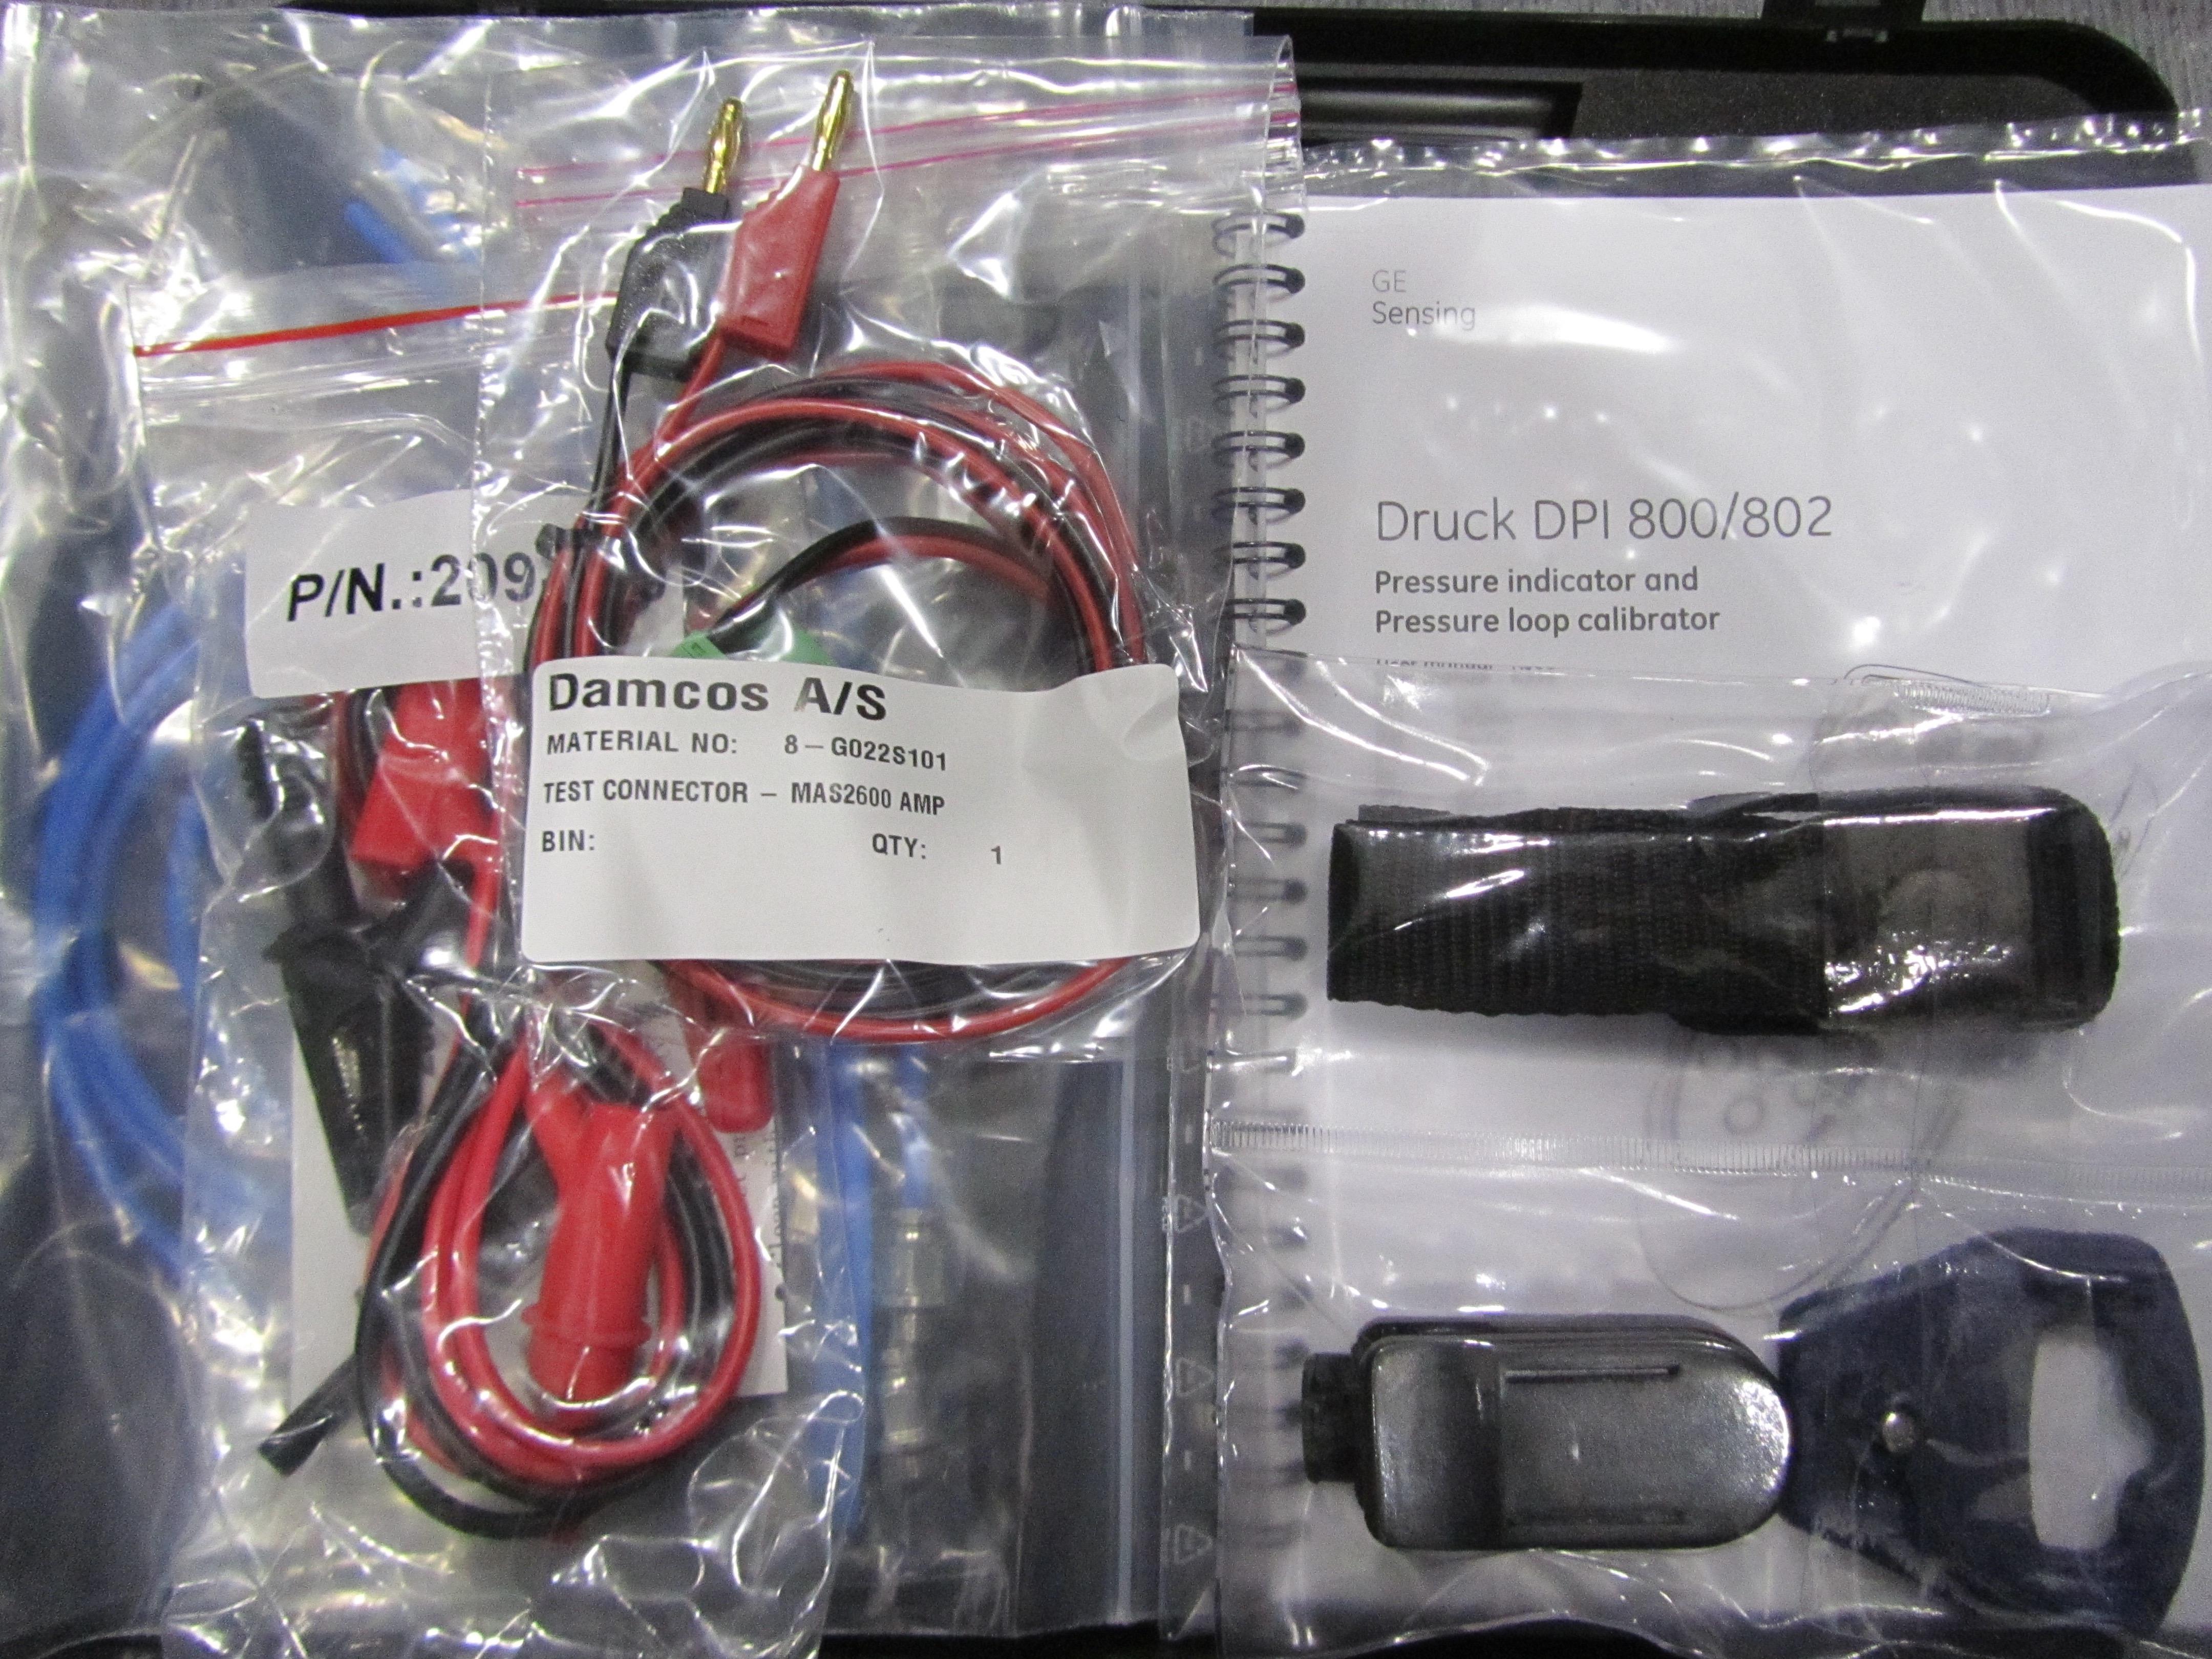 Emerson Damcos MAS2600 Calibrator Kit 8-DPI802P CAL KIT – Damcos Parts